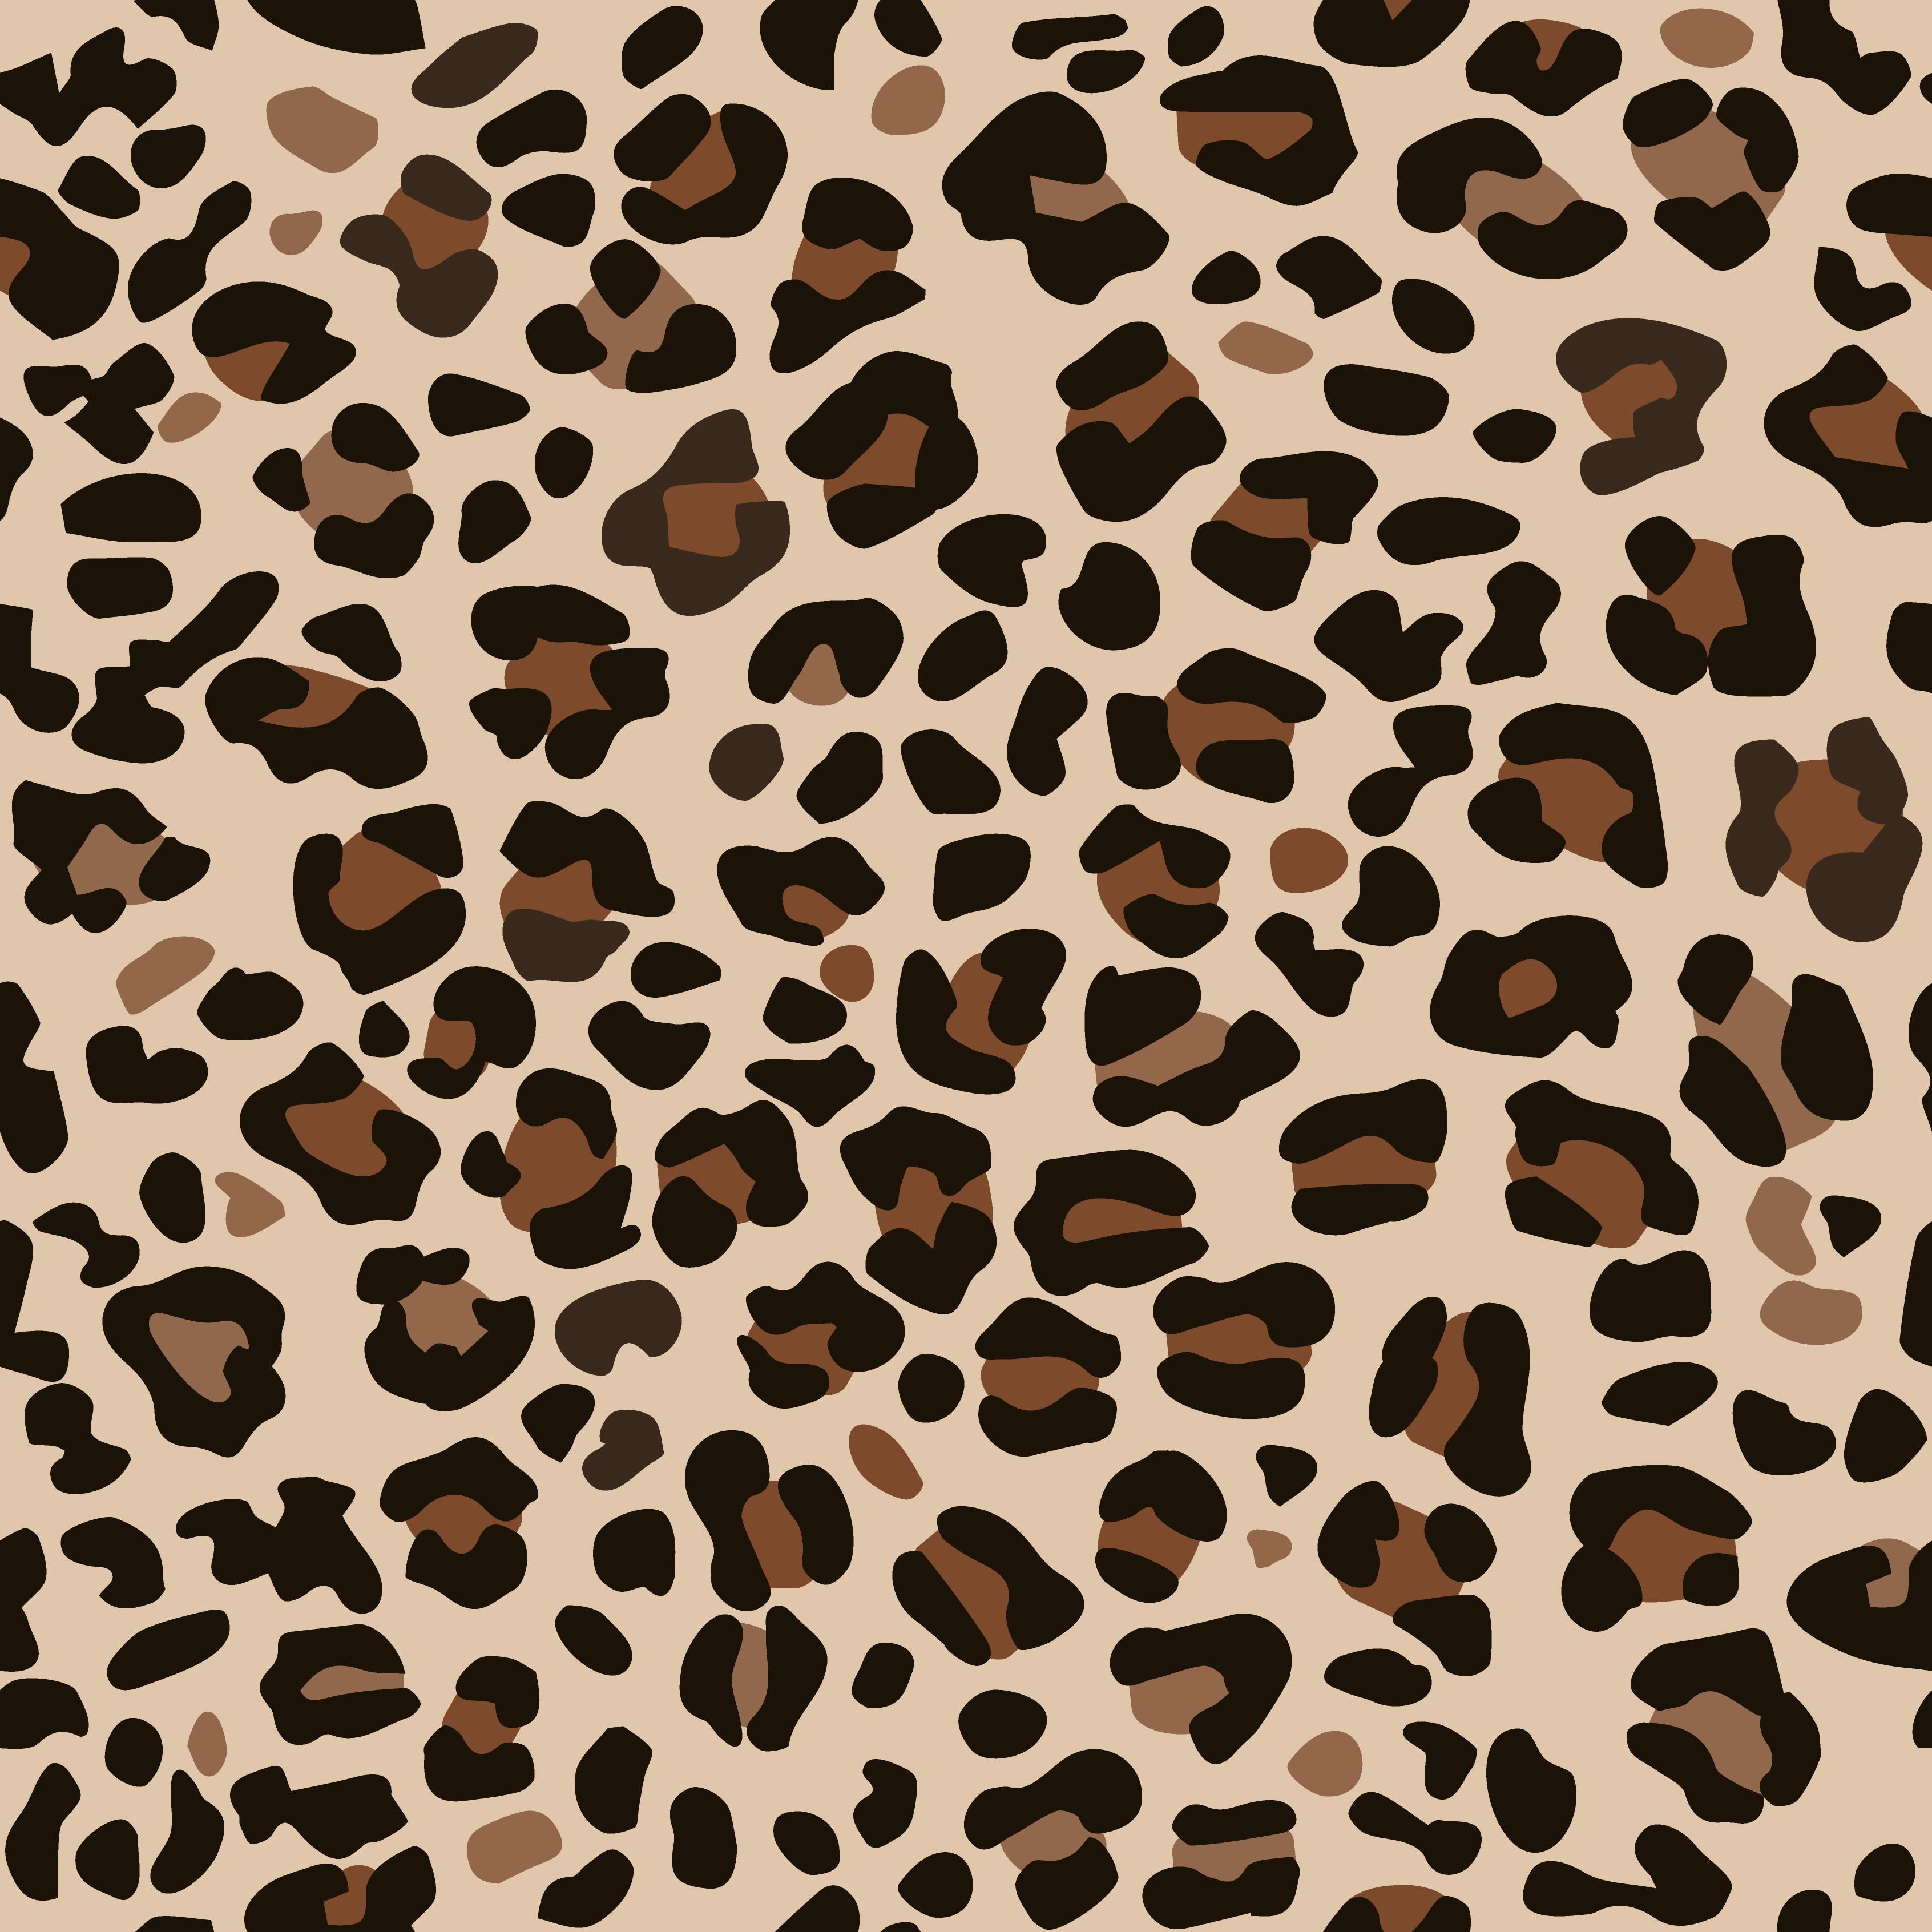 Leopard Print Home Decor:  Leopard Brown Print .